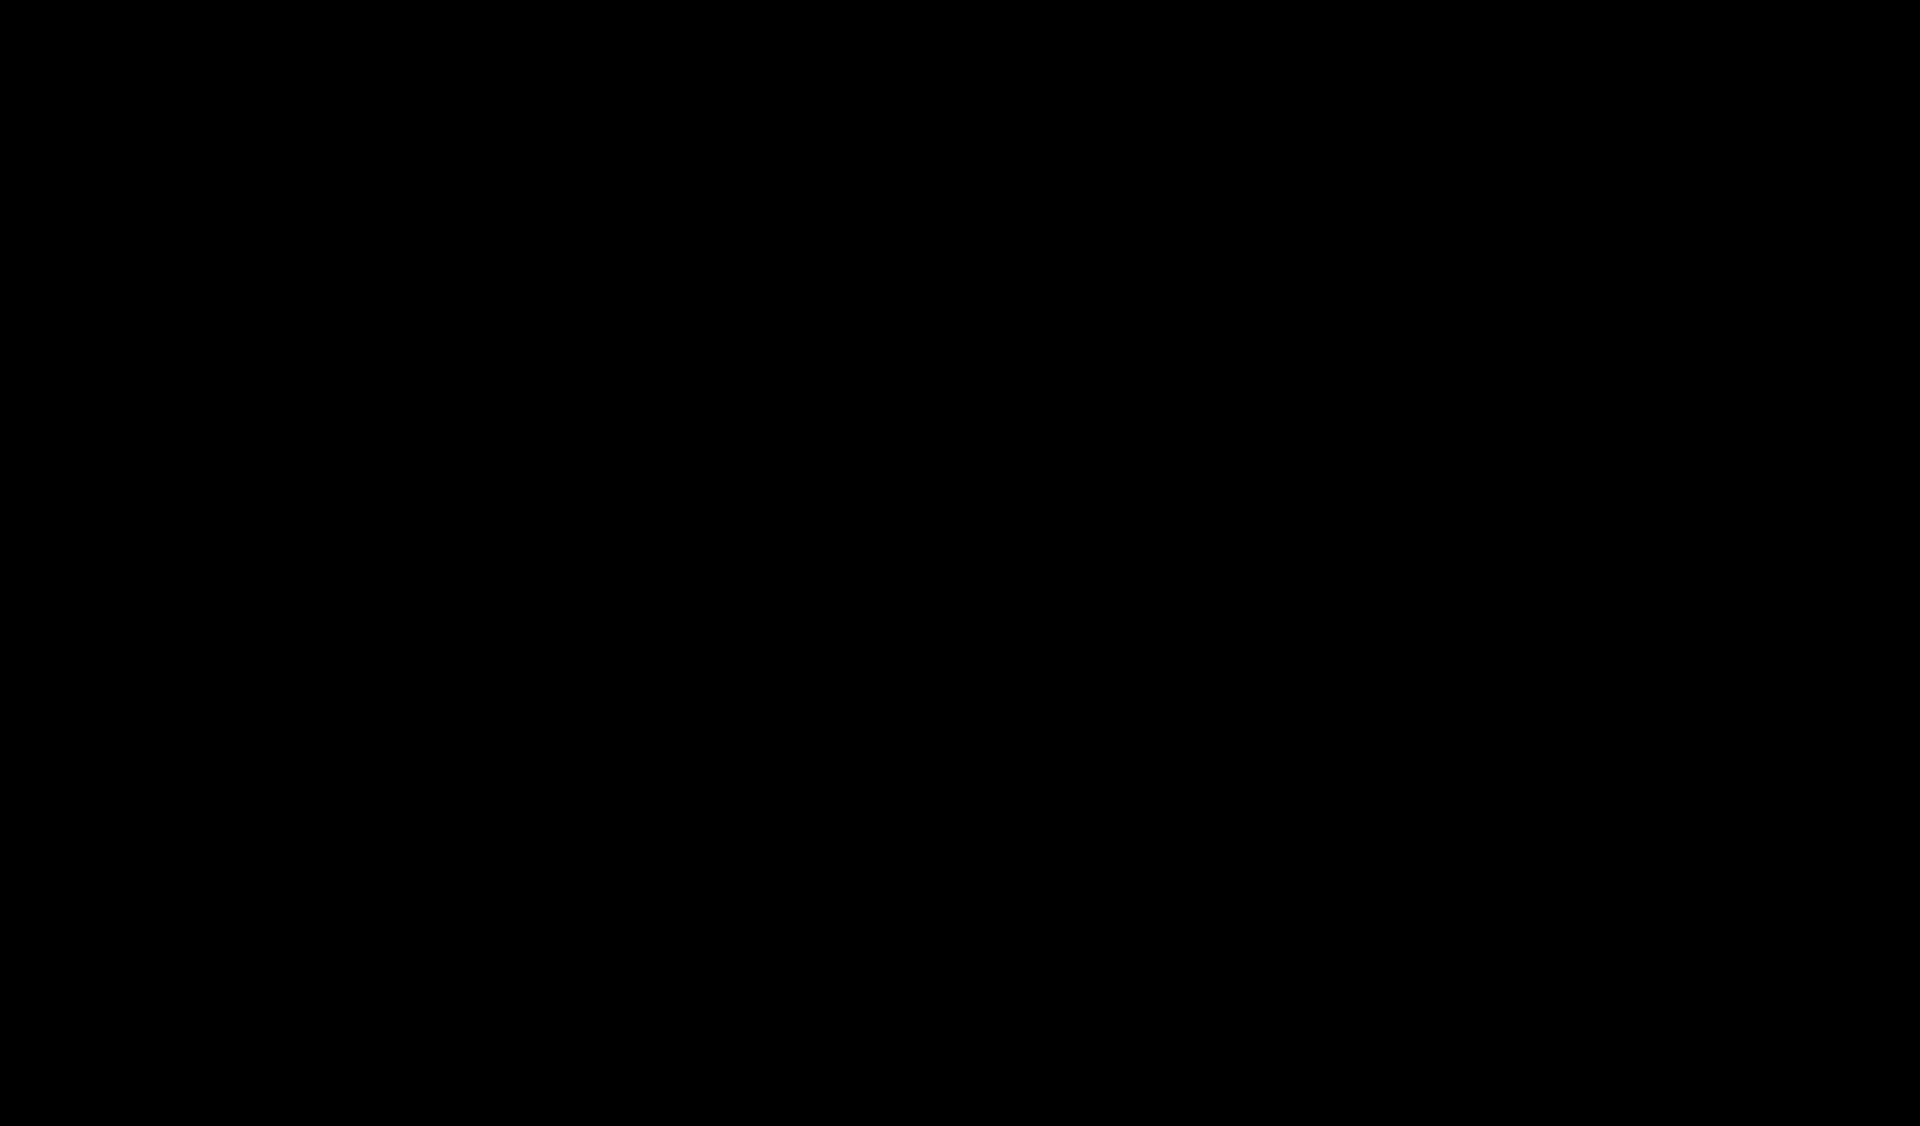 test-image-2